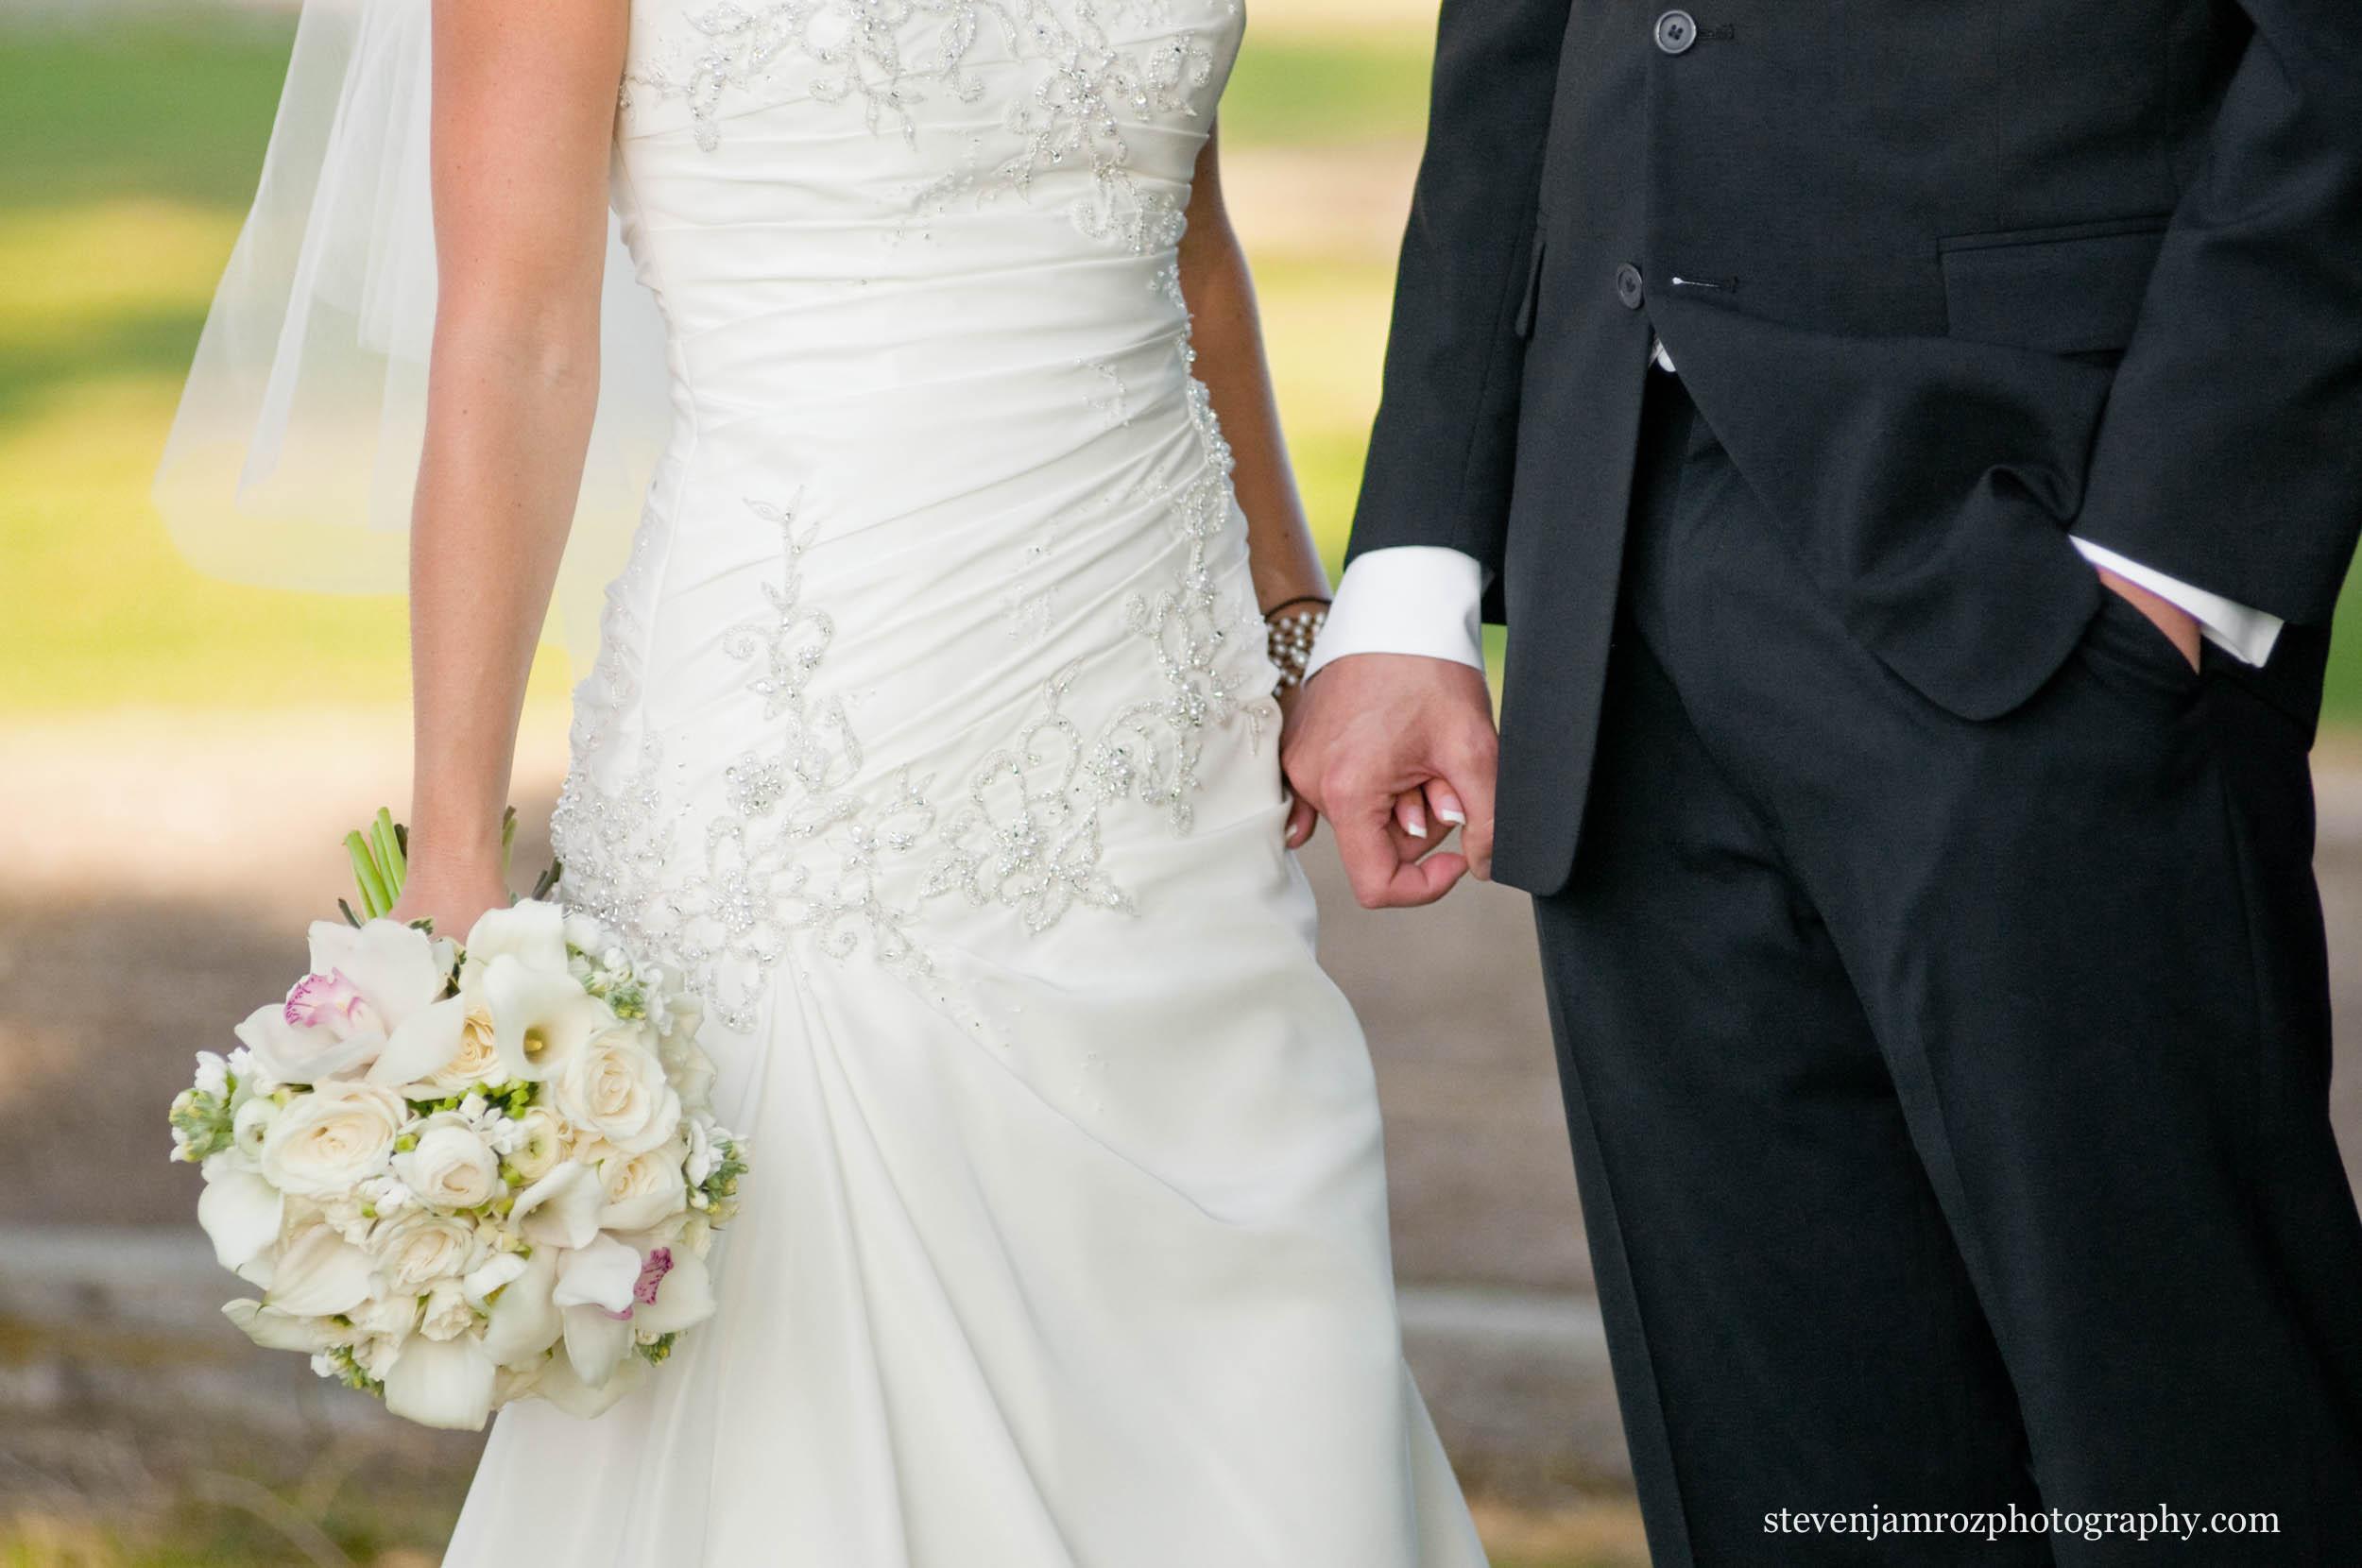 flowers-hands-black-tux-wedding-steven-jamroz-photography-0029.jpg